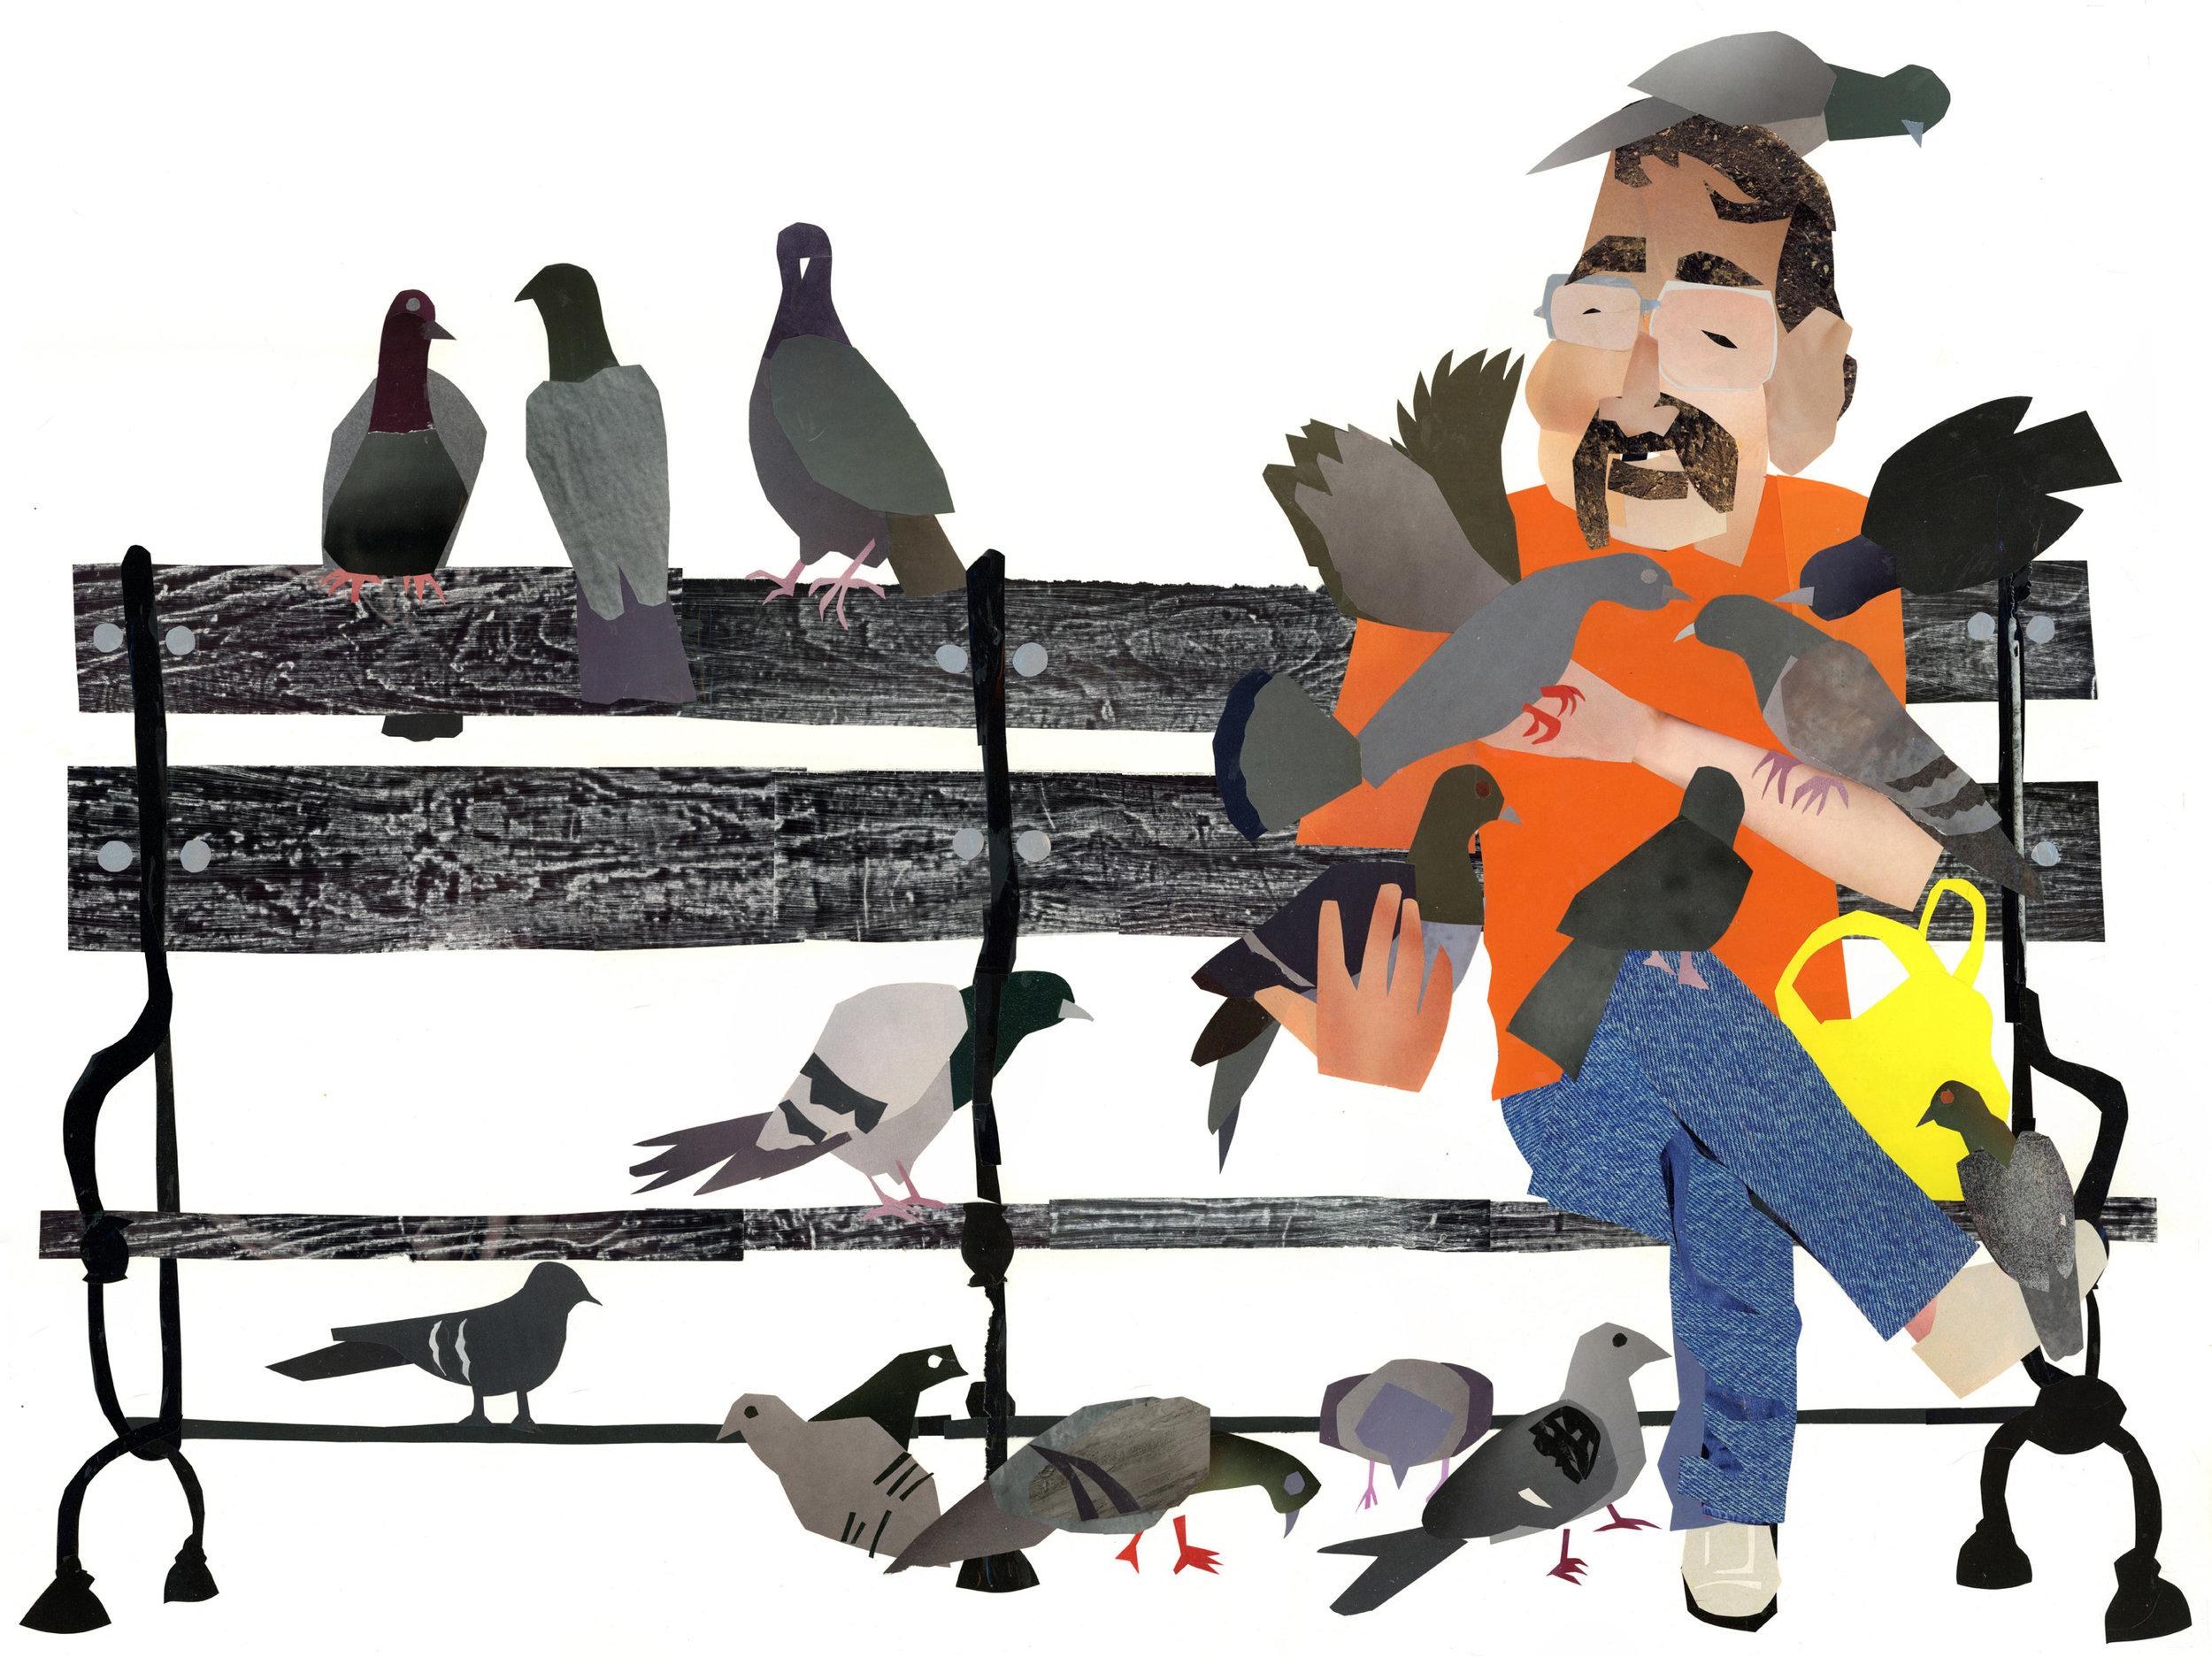 Paul the Birdman of Washington Square Park